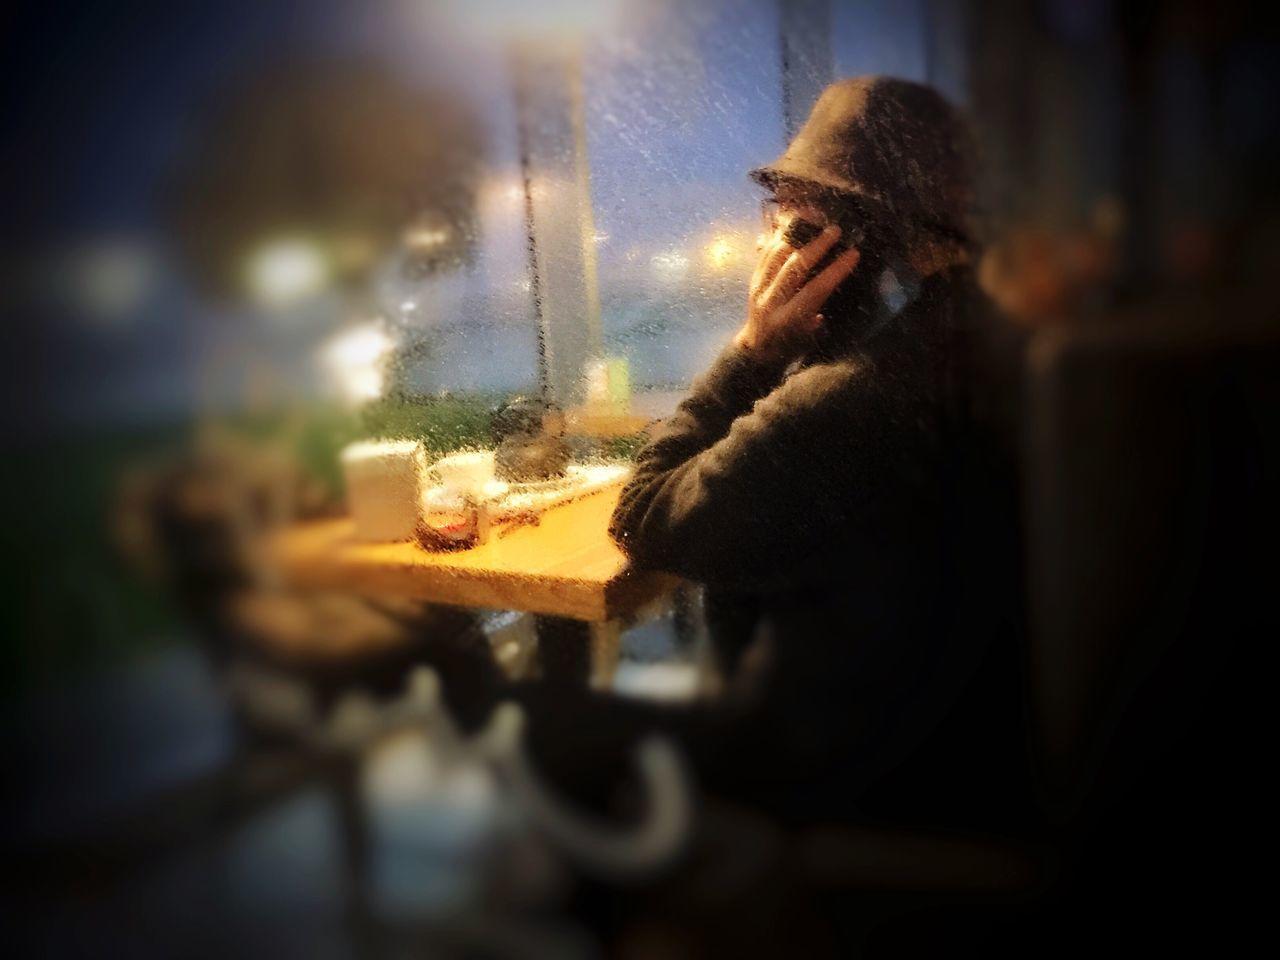 Indoors  Real People Night Rainy Day Mobilephotography WeAreJuxt.com NEM Submissions AMPt_community EyeEm Porto Tranquil Scene NEM GoodKarma Mob Fiction NEM Memories NEM Silence